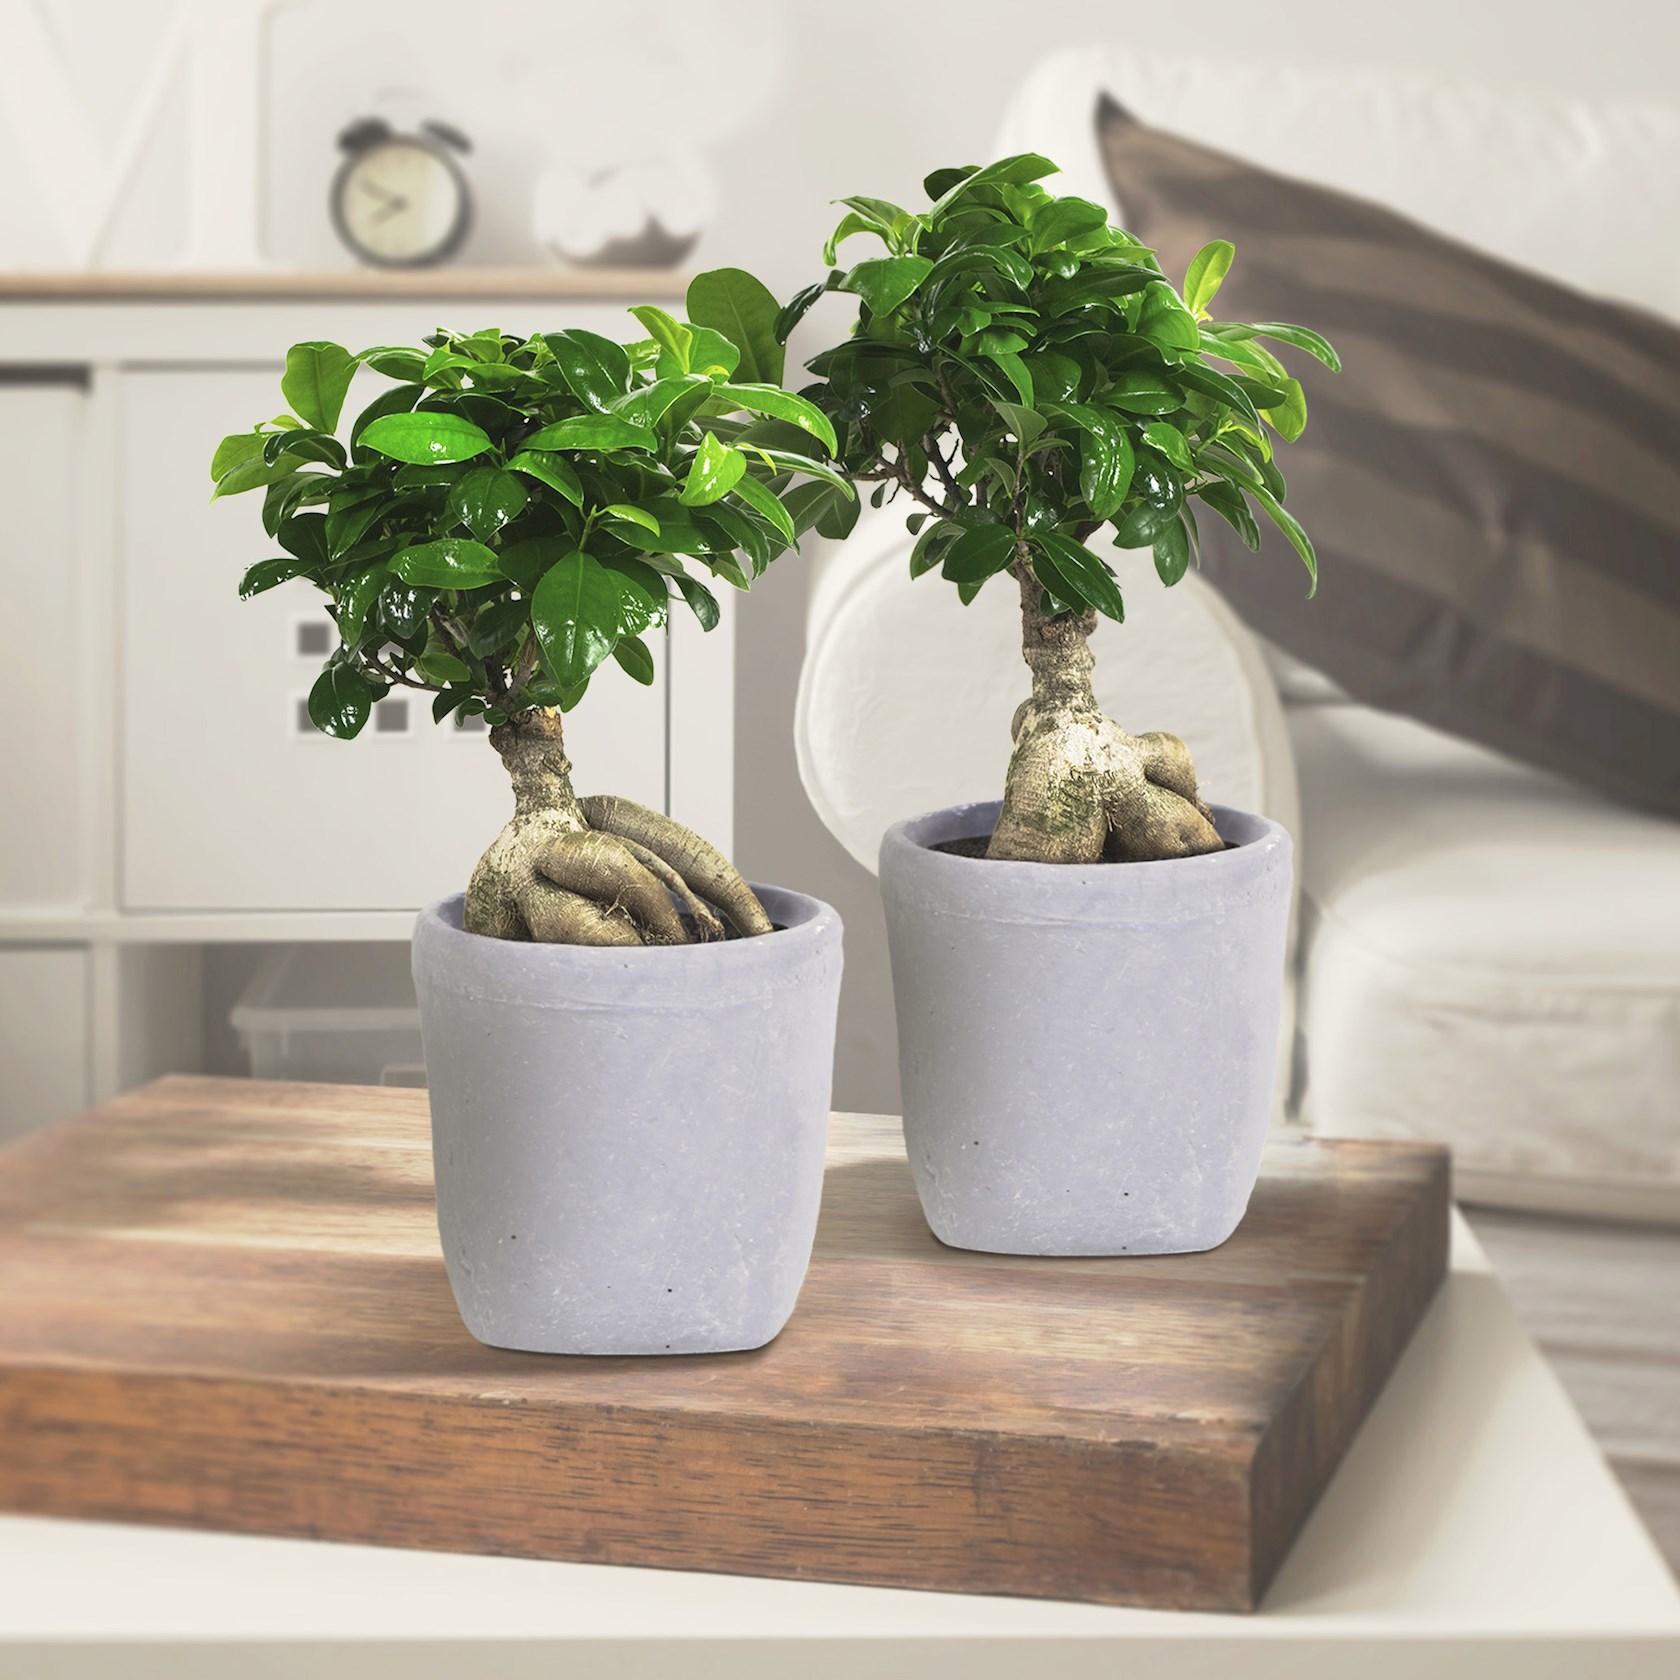 2 stuks Ficus - Ficus Gin Seng 40cm hoog